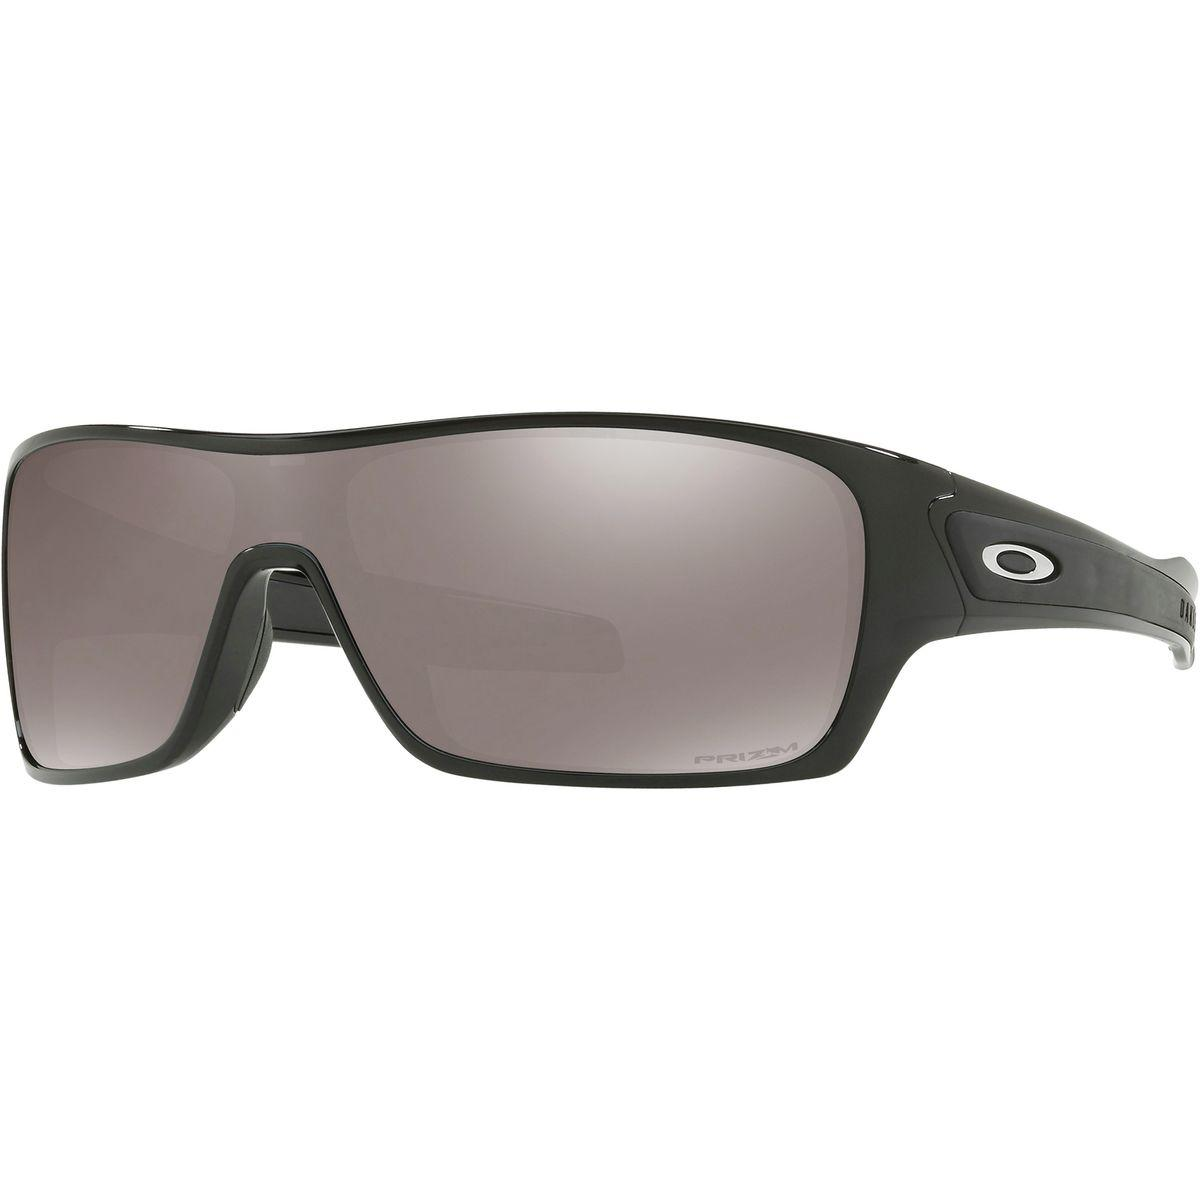 e0b8c9d8419 Lyst - Oakley Turbine Rotor Prizm Sunglasses in Black for Men